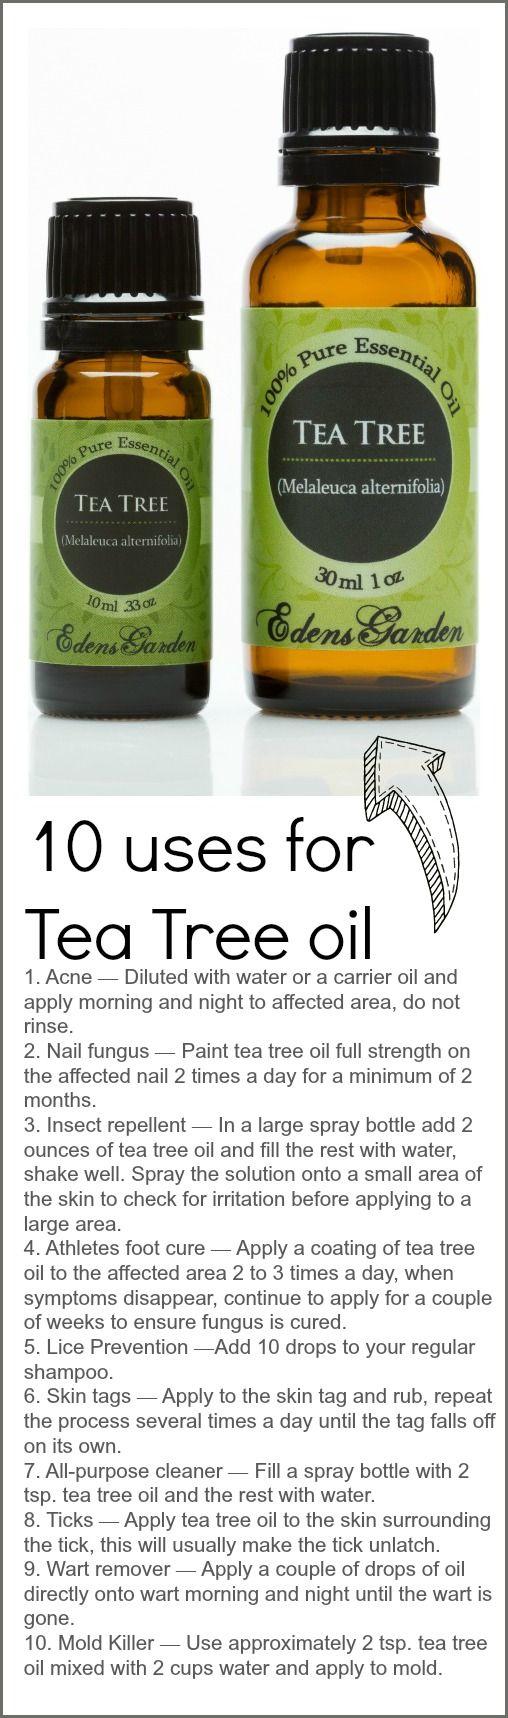 10 Uses For Tea Tree Oil